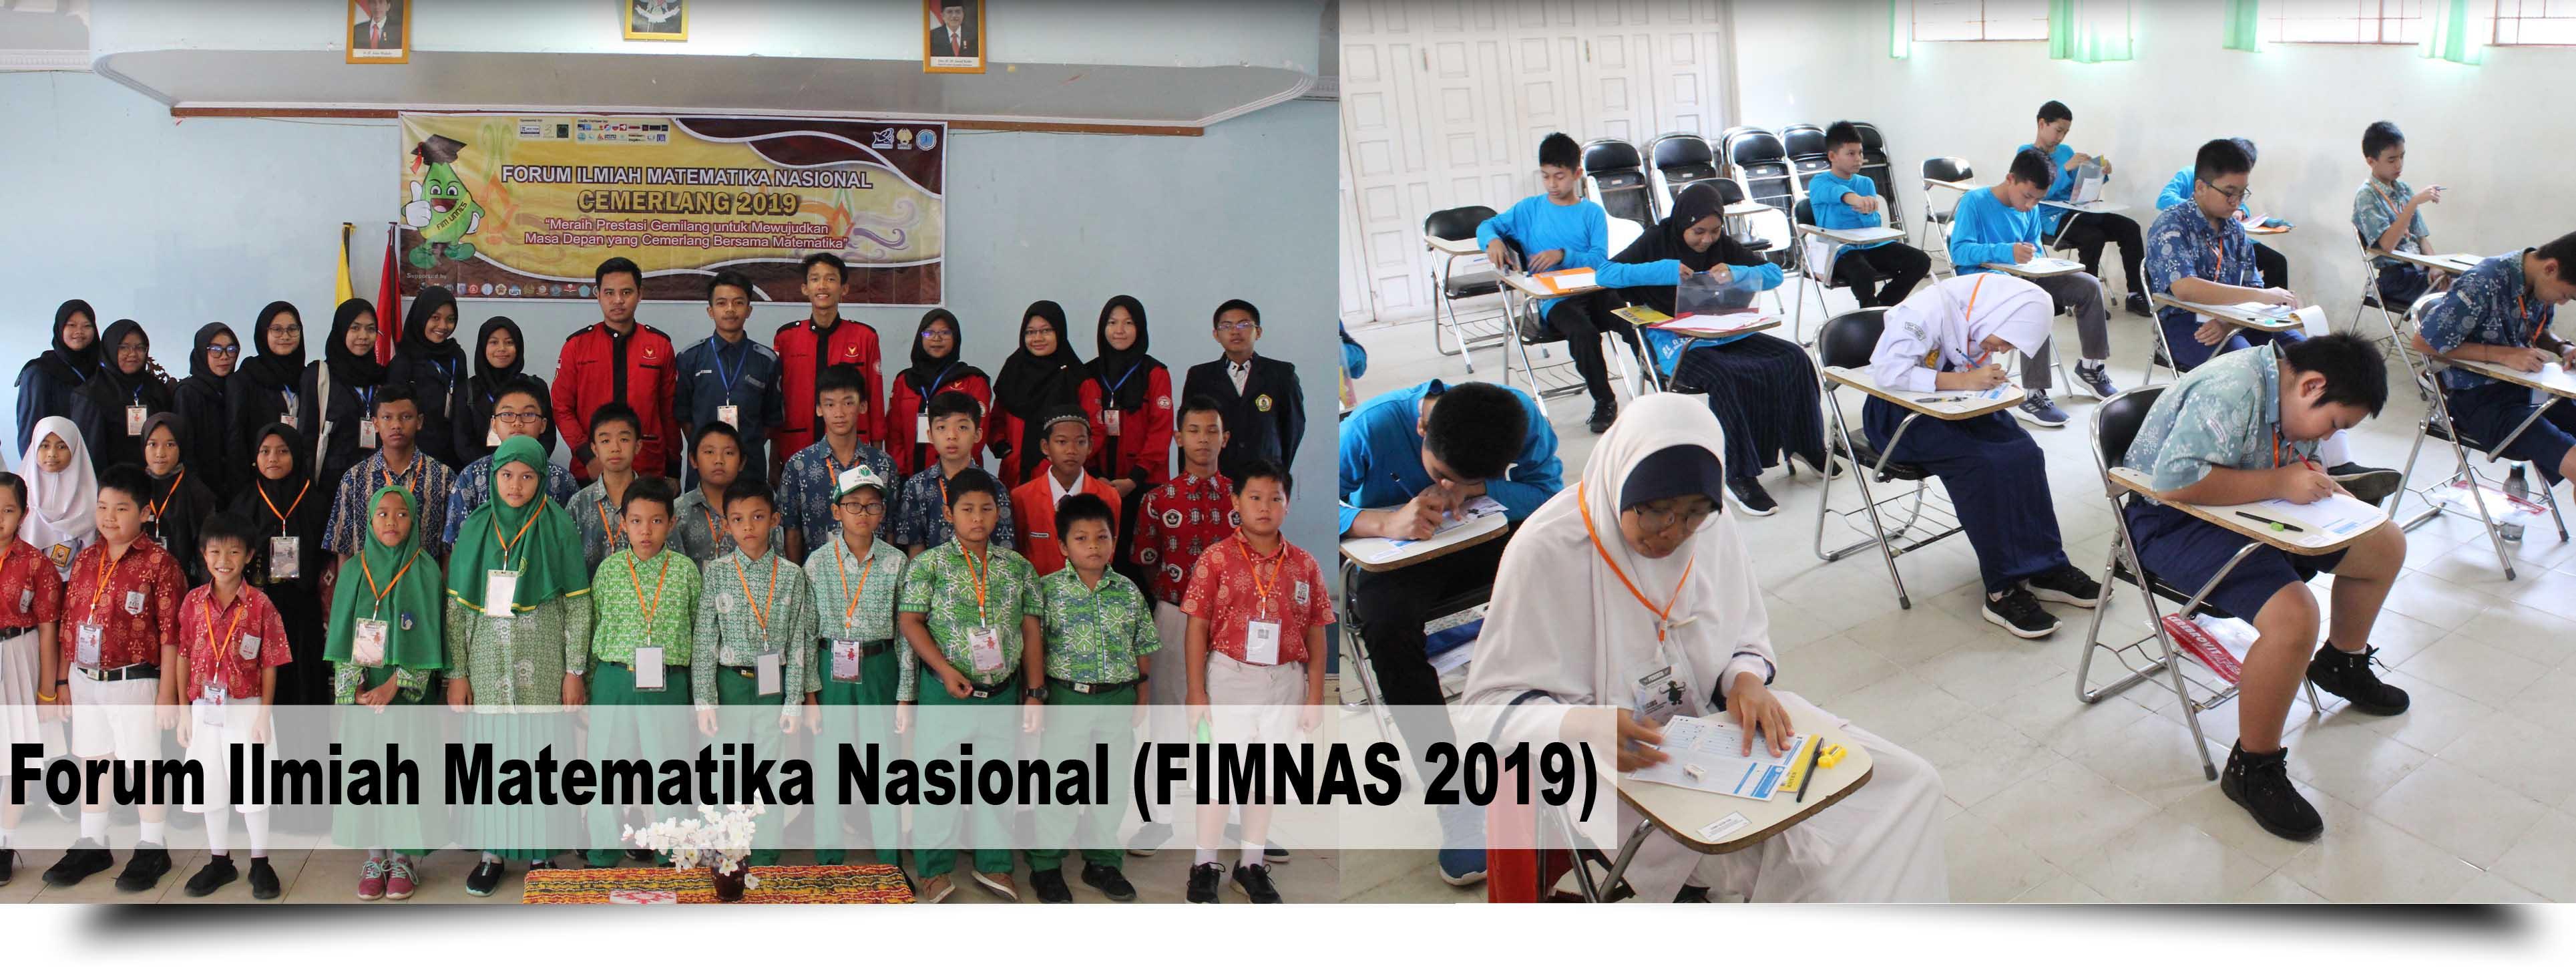 Forum Ilmiah Matematika Nasional (FIMNAS 2019)